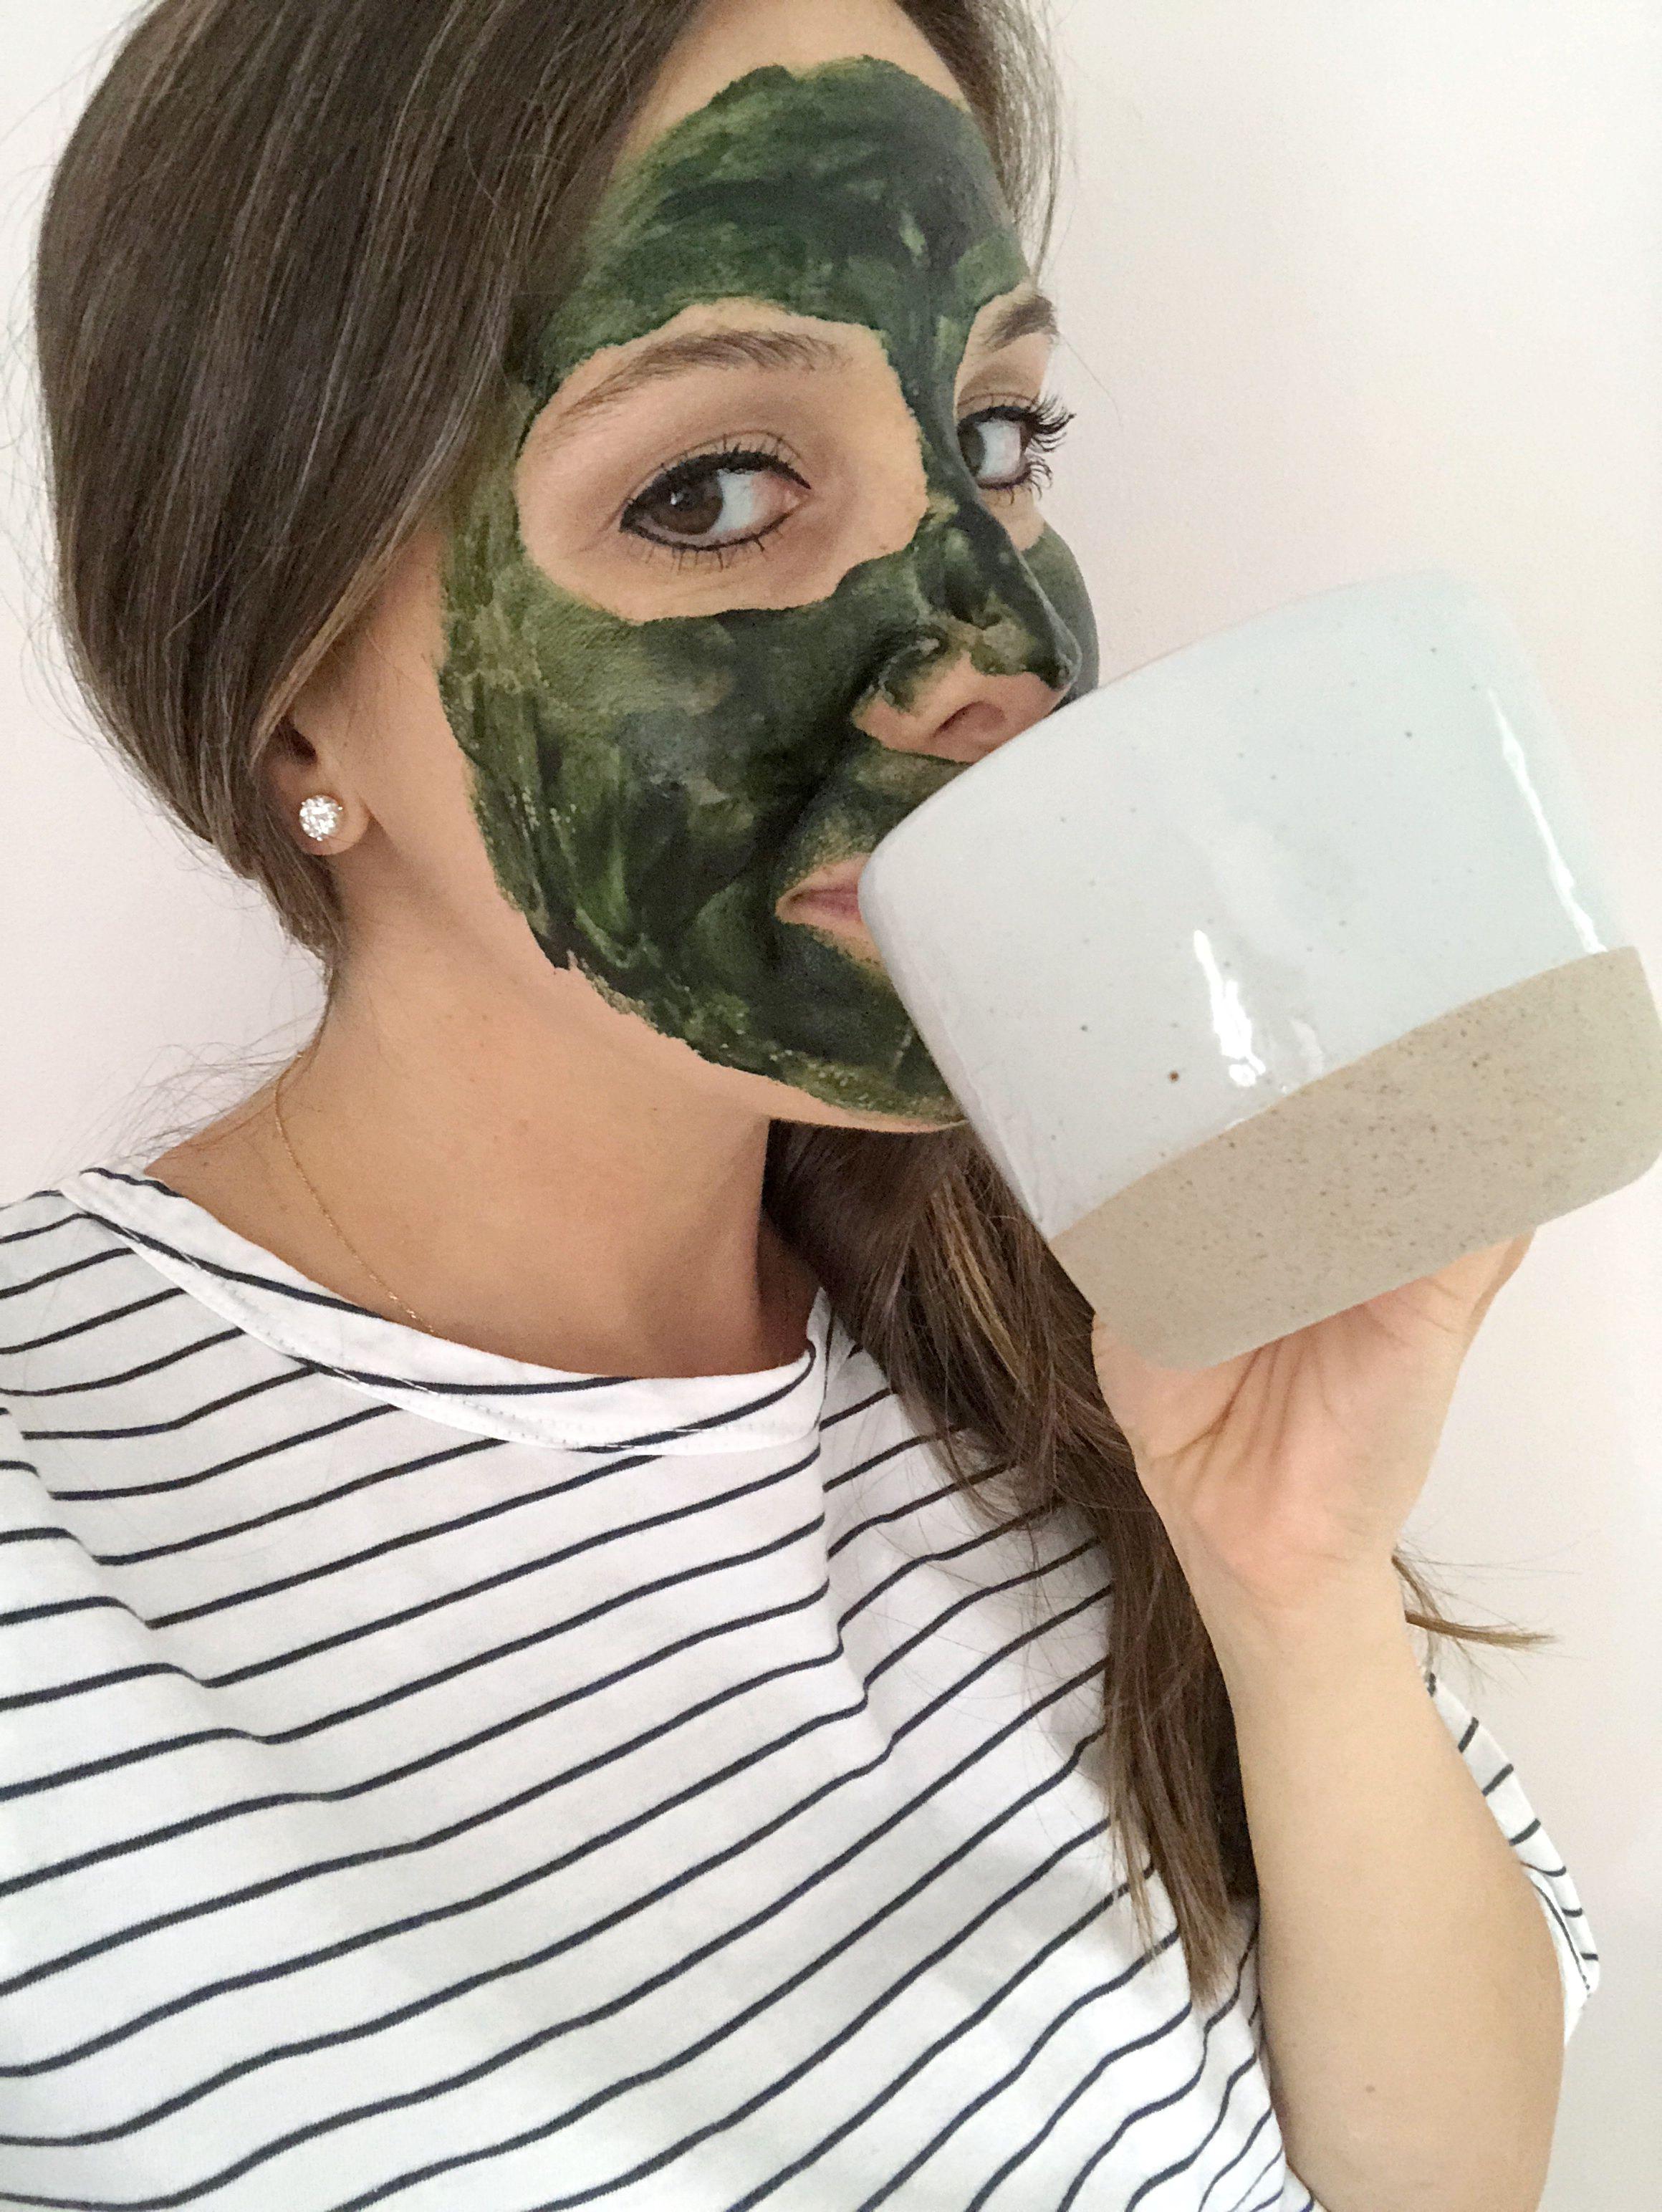 Skin Brightening Probiotic Yogurt Honey Spirulina Face Mask Recipe Skin Brightening Skin Brightening Cream Products Skin Brightening Diy